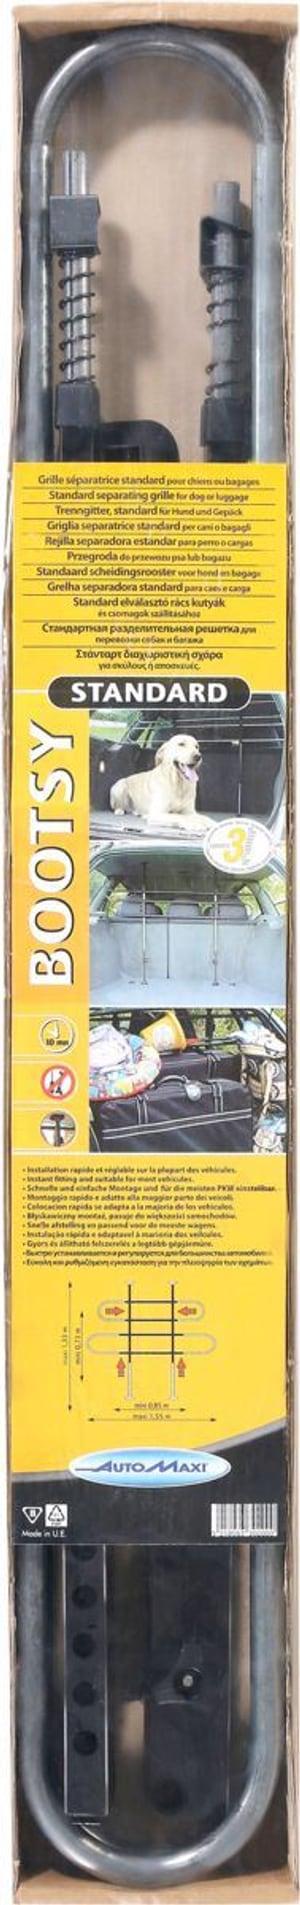 Automaxi  Bootsy Grille séparatrice